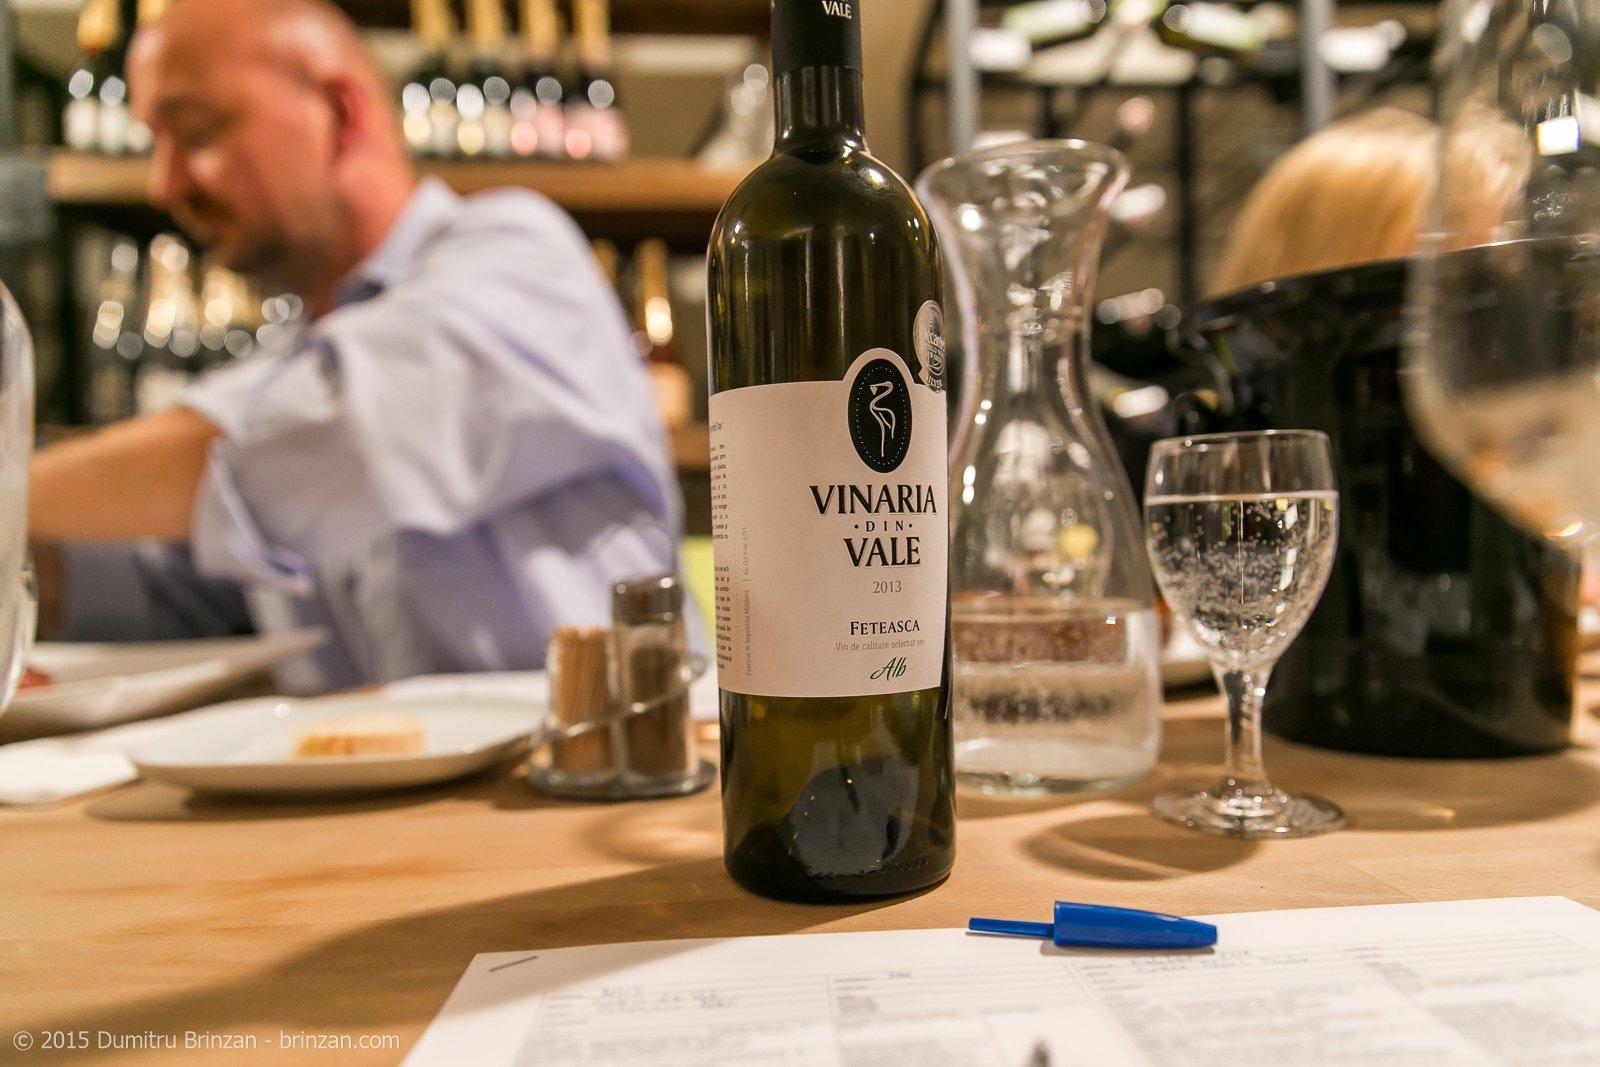 A bottle of Vinaria din Vale Feteasca Alba 2013 on a Table